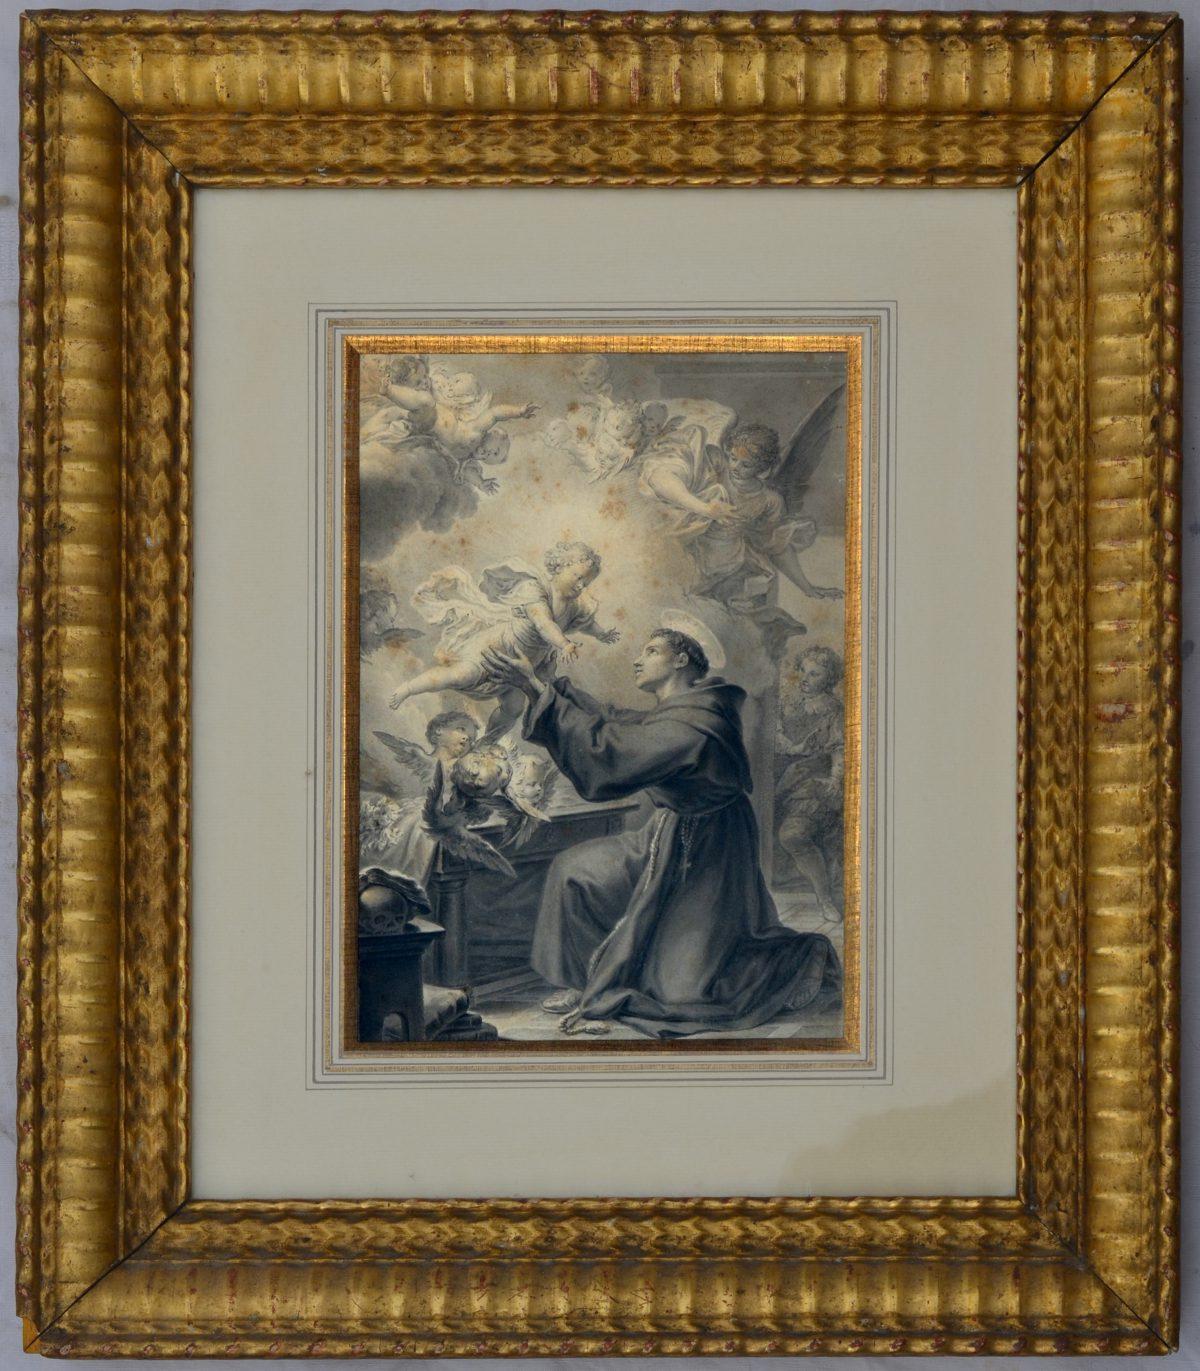 Ubaldo Gandolfi (1728 San Giovanni in Persiceto - 1781 Ravenne)